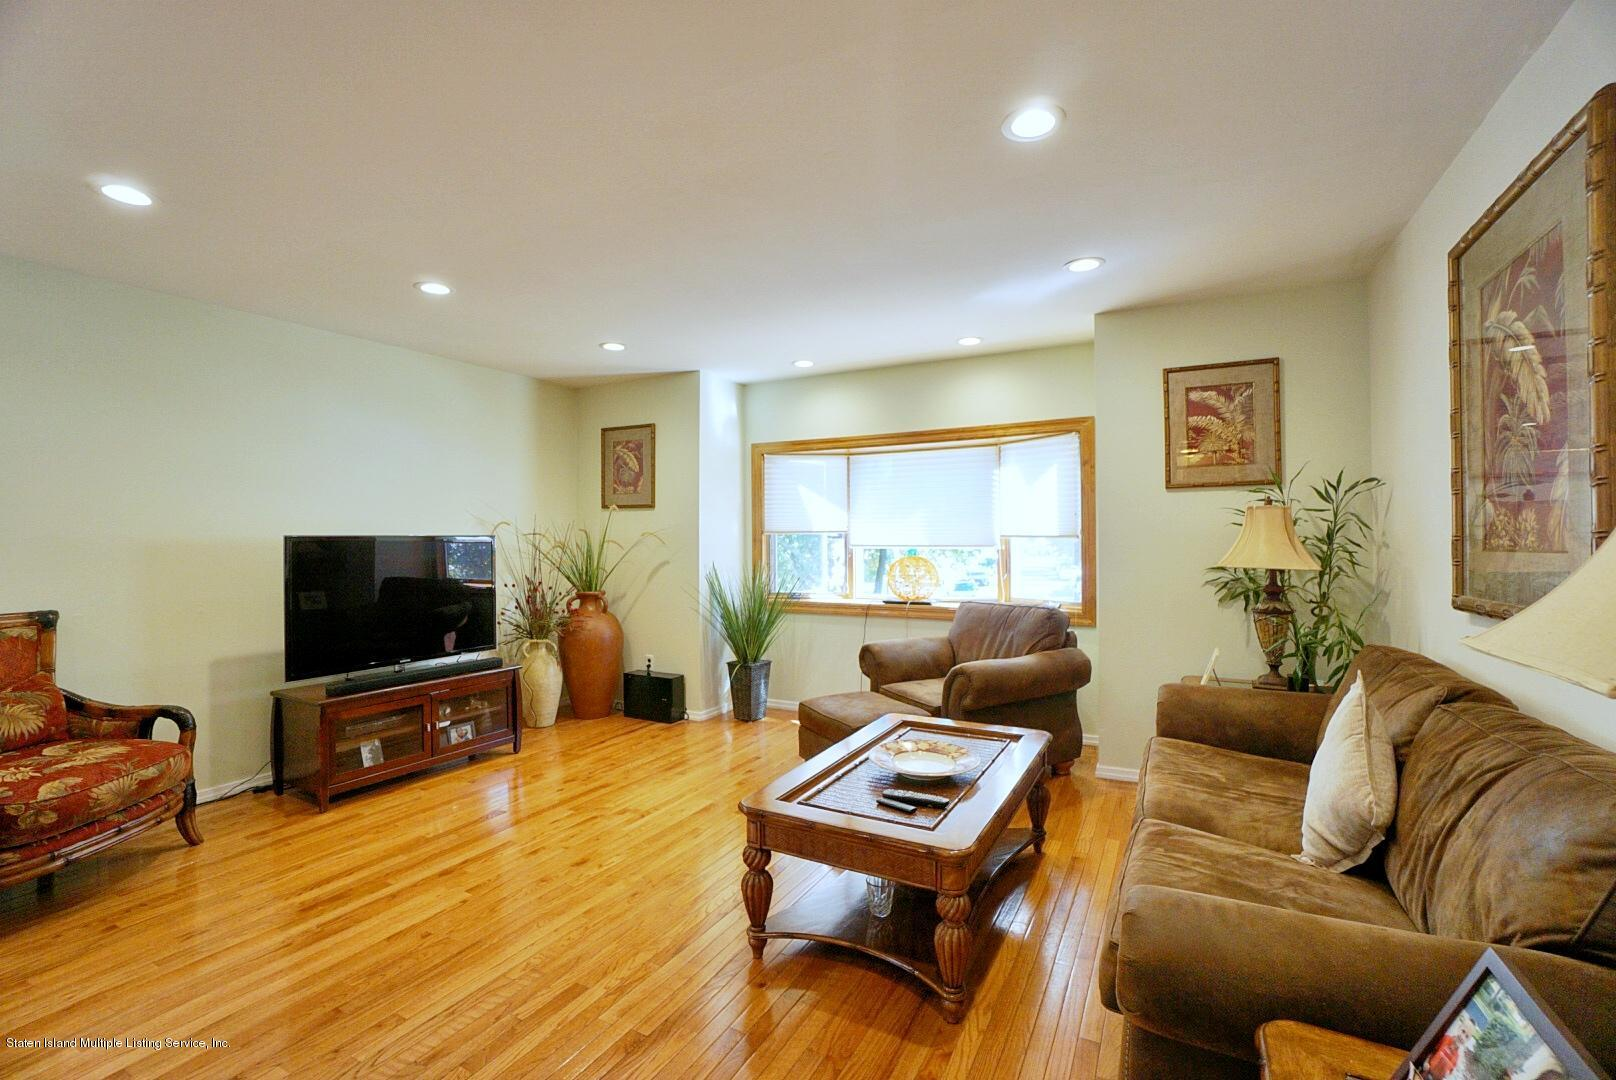 Single Family - Semi-Attached 47 Ilyse Court   Staten Island, NY 10306, MLS-1141335-7